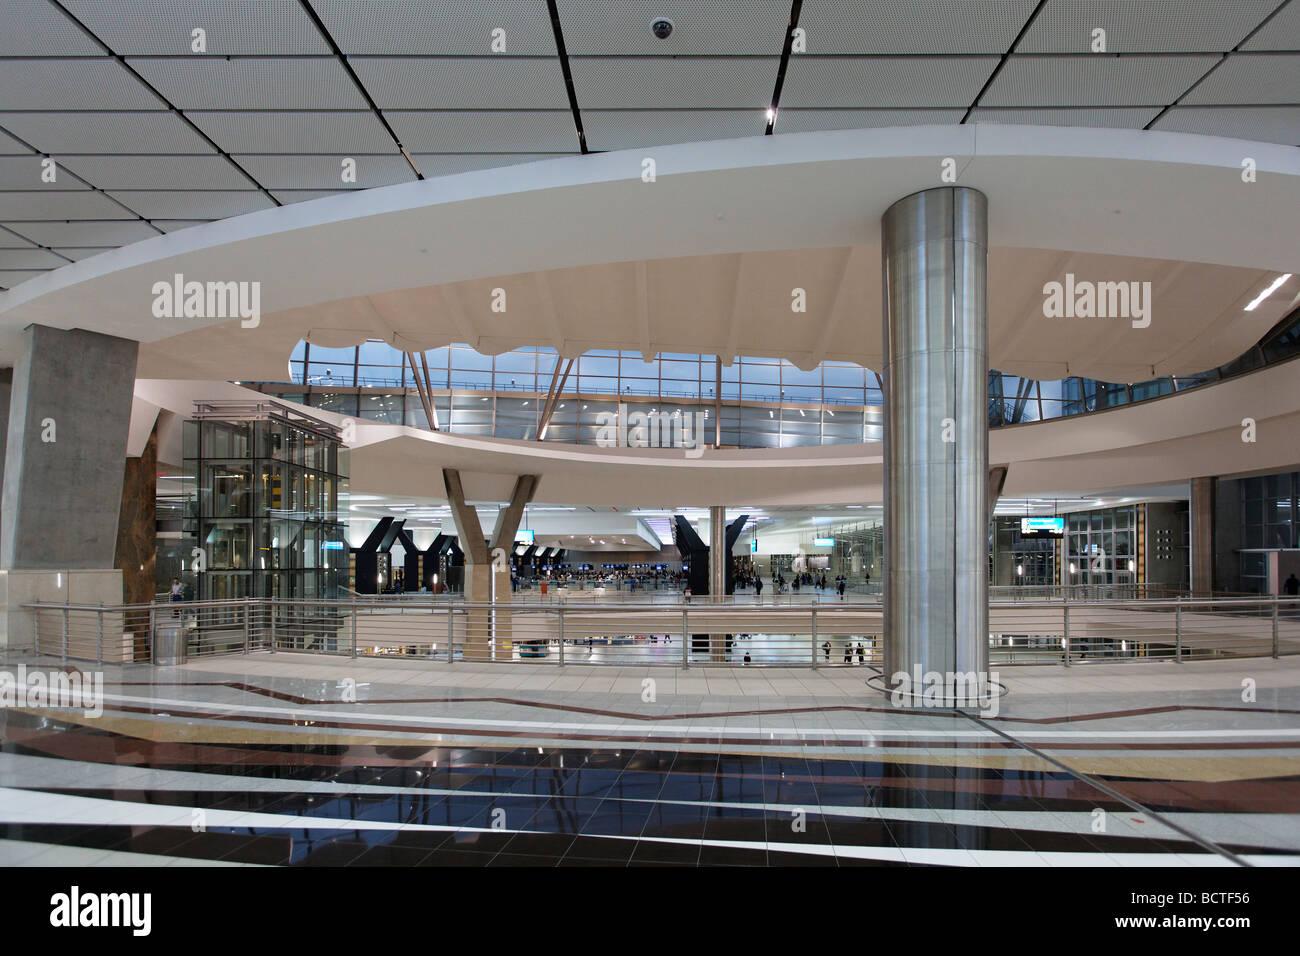 Ankunft Halle, O R Tambo International Airport, Johannesburg, Südafrika, Afrika Stockbild